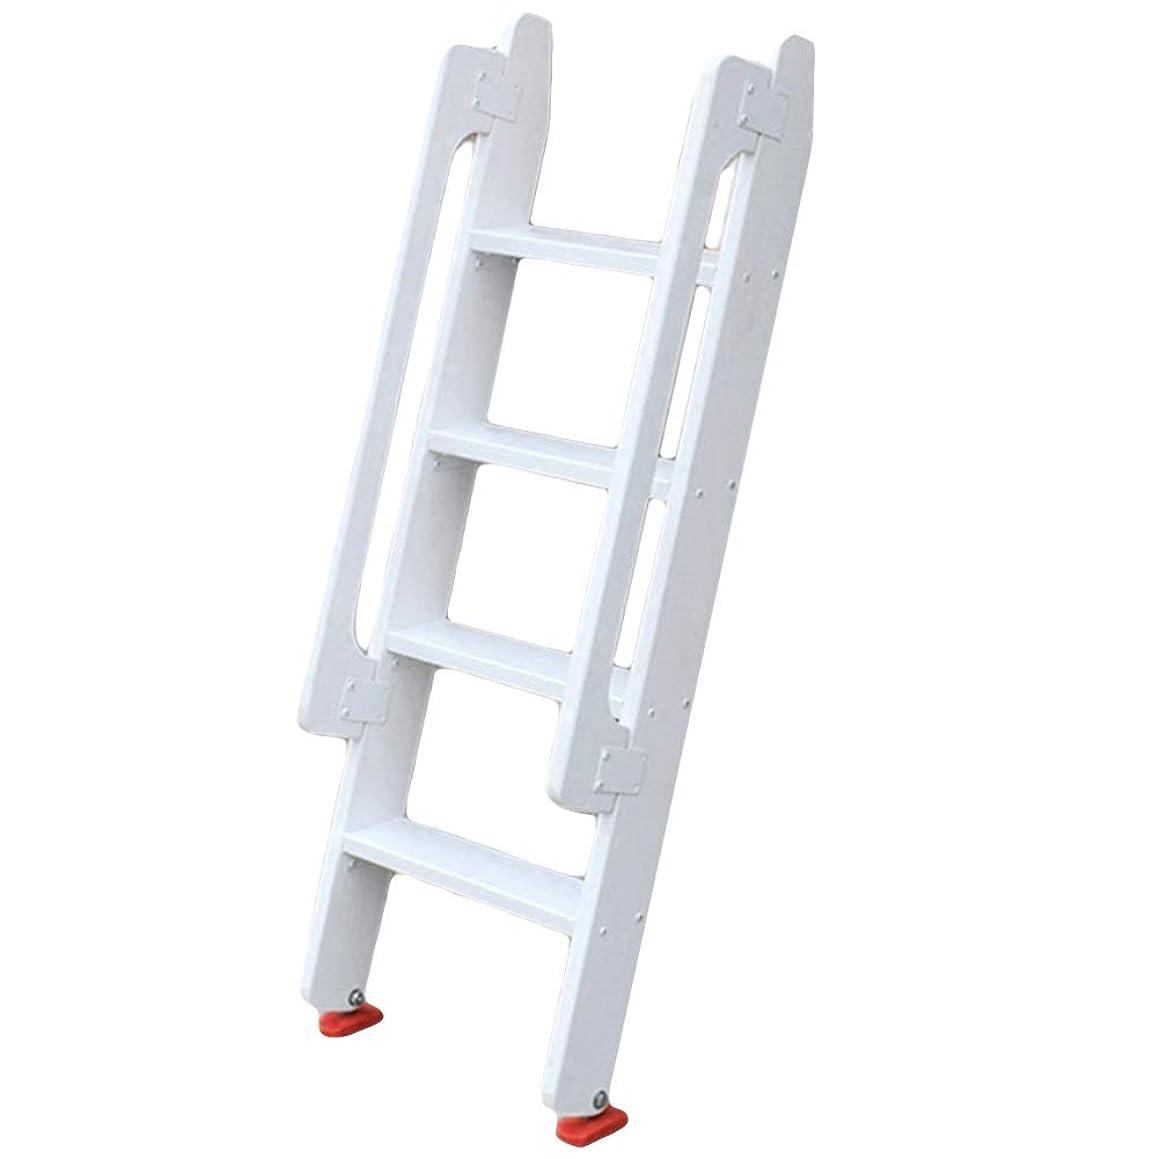 White 4-Step Wooden Ladder, Household Ladder, Straight Ladder with Handrail (Size : 4 Step (125cm high))